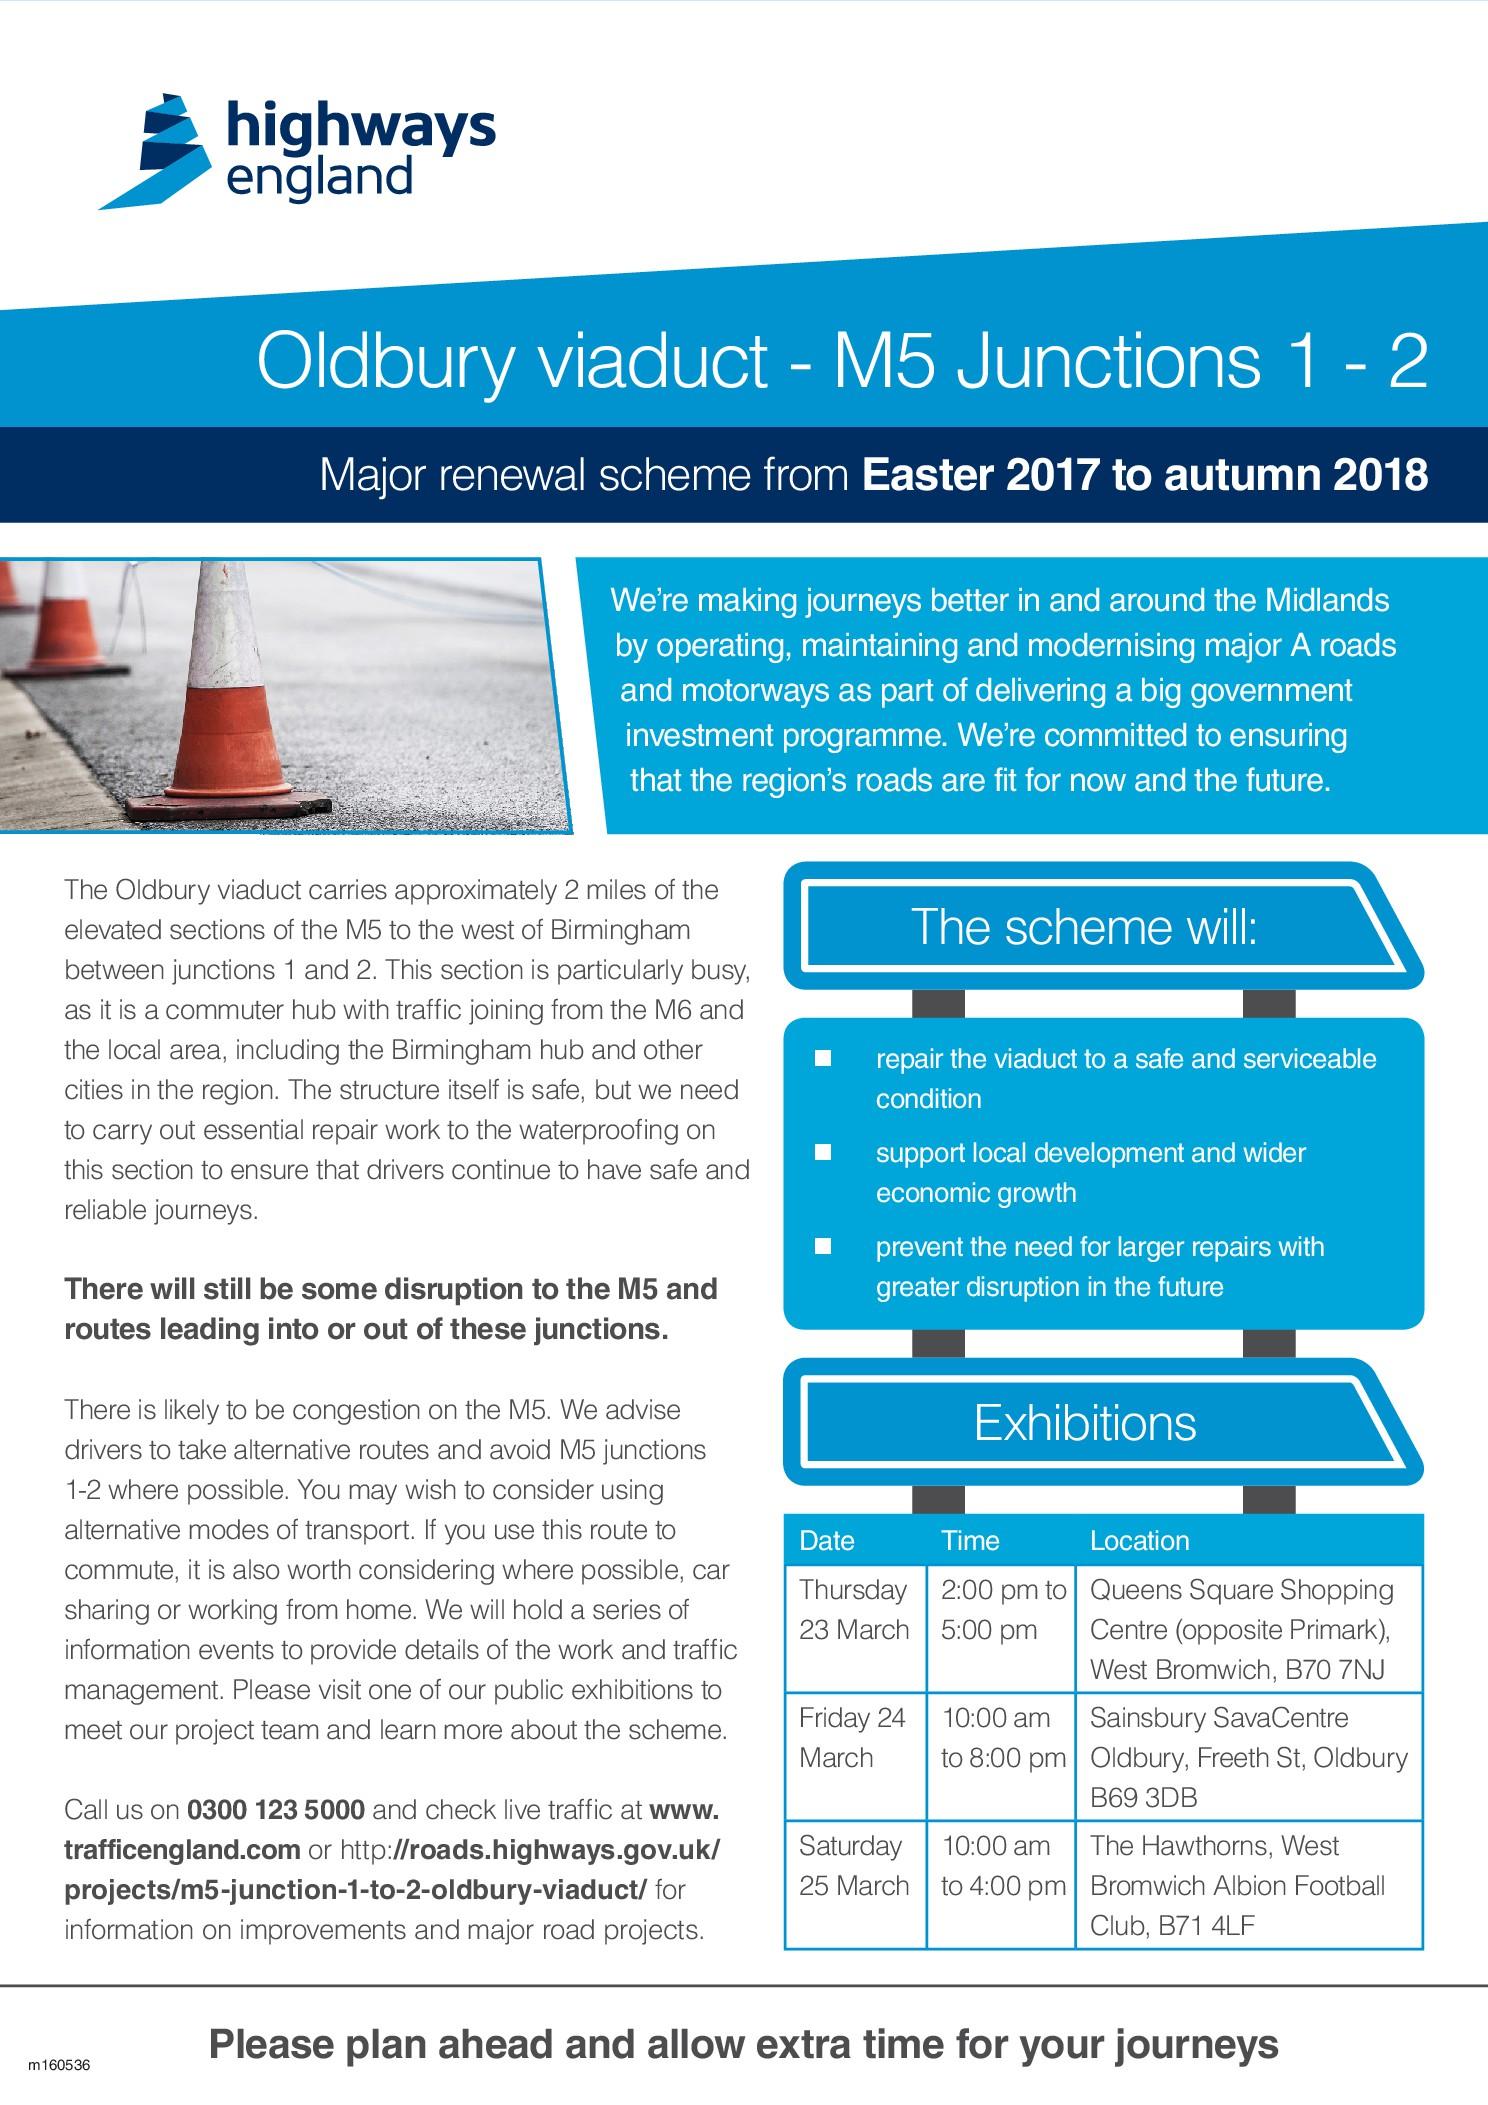 Oldbury Viaduct M5 Junctions 1 to 2 – Major Renewal Scheme